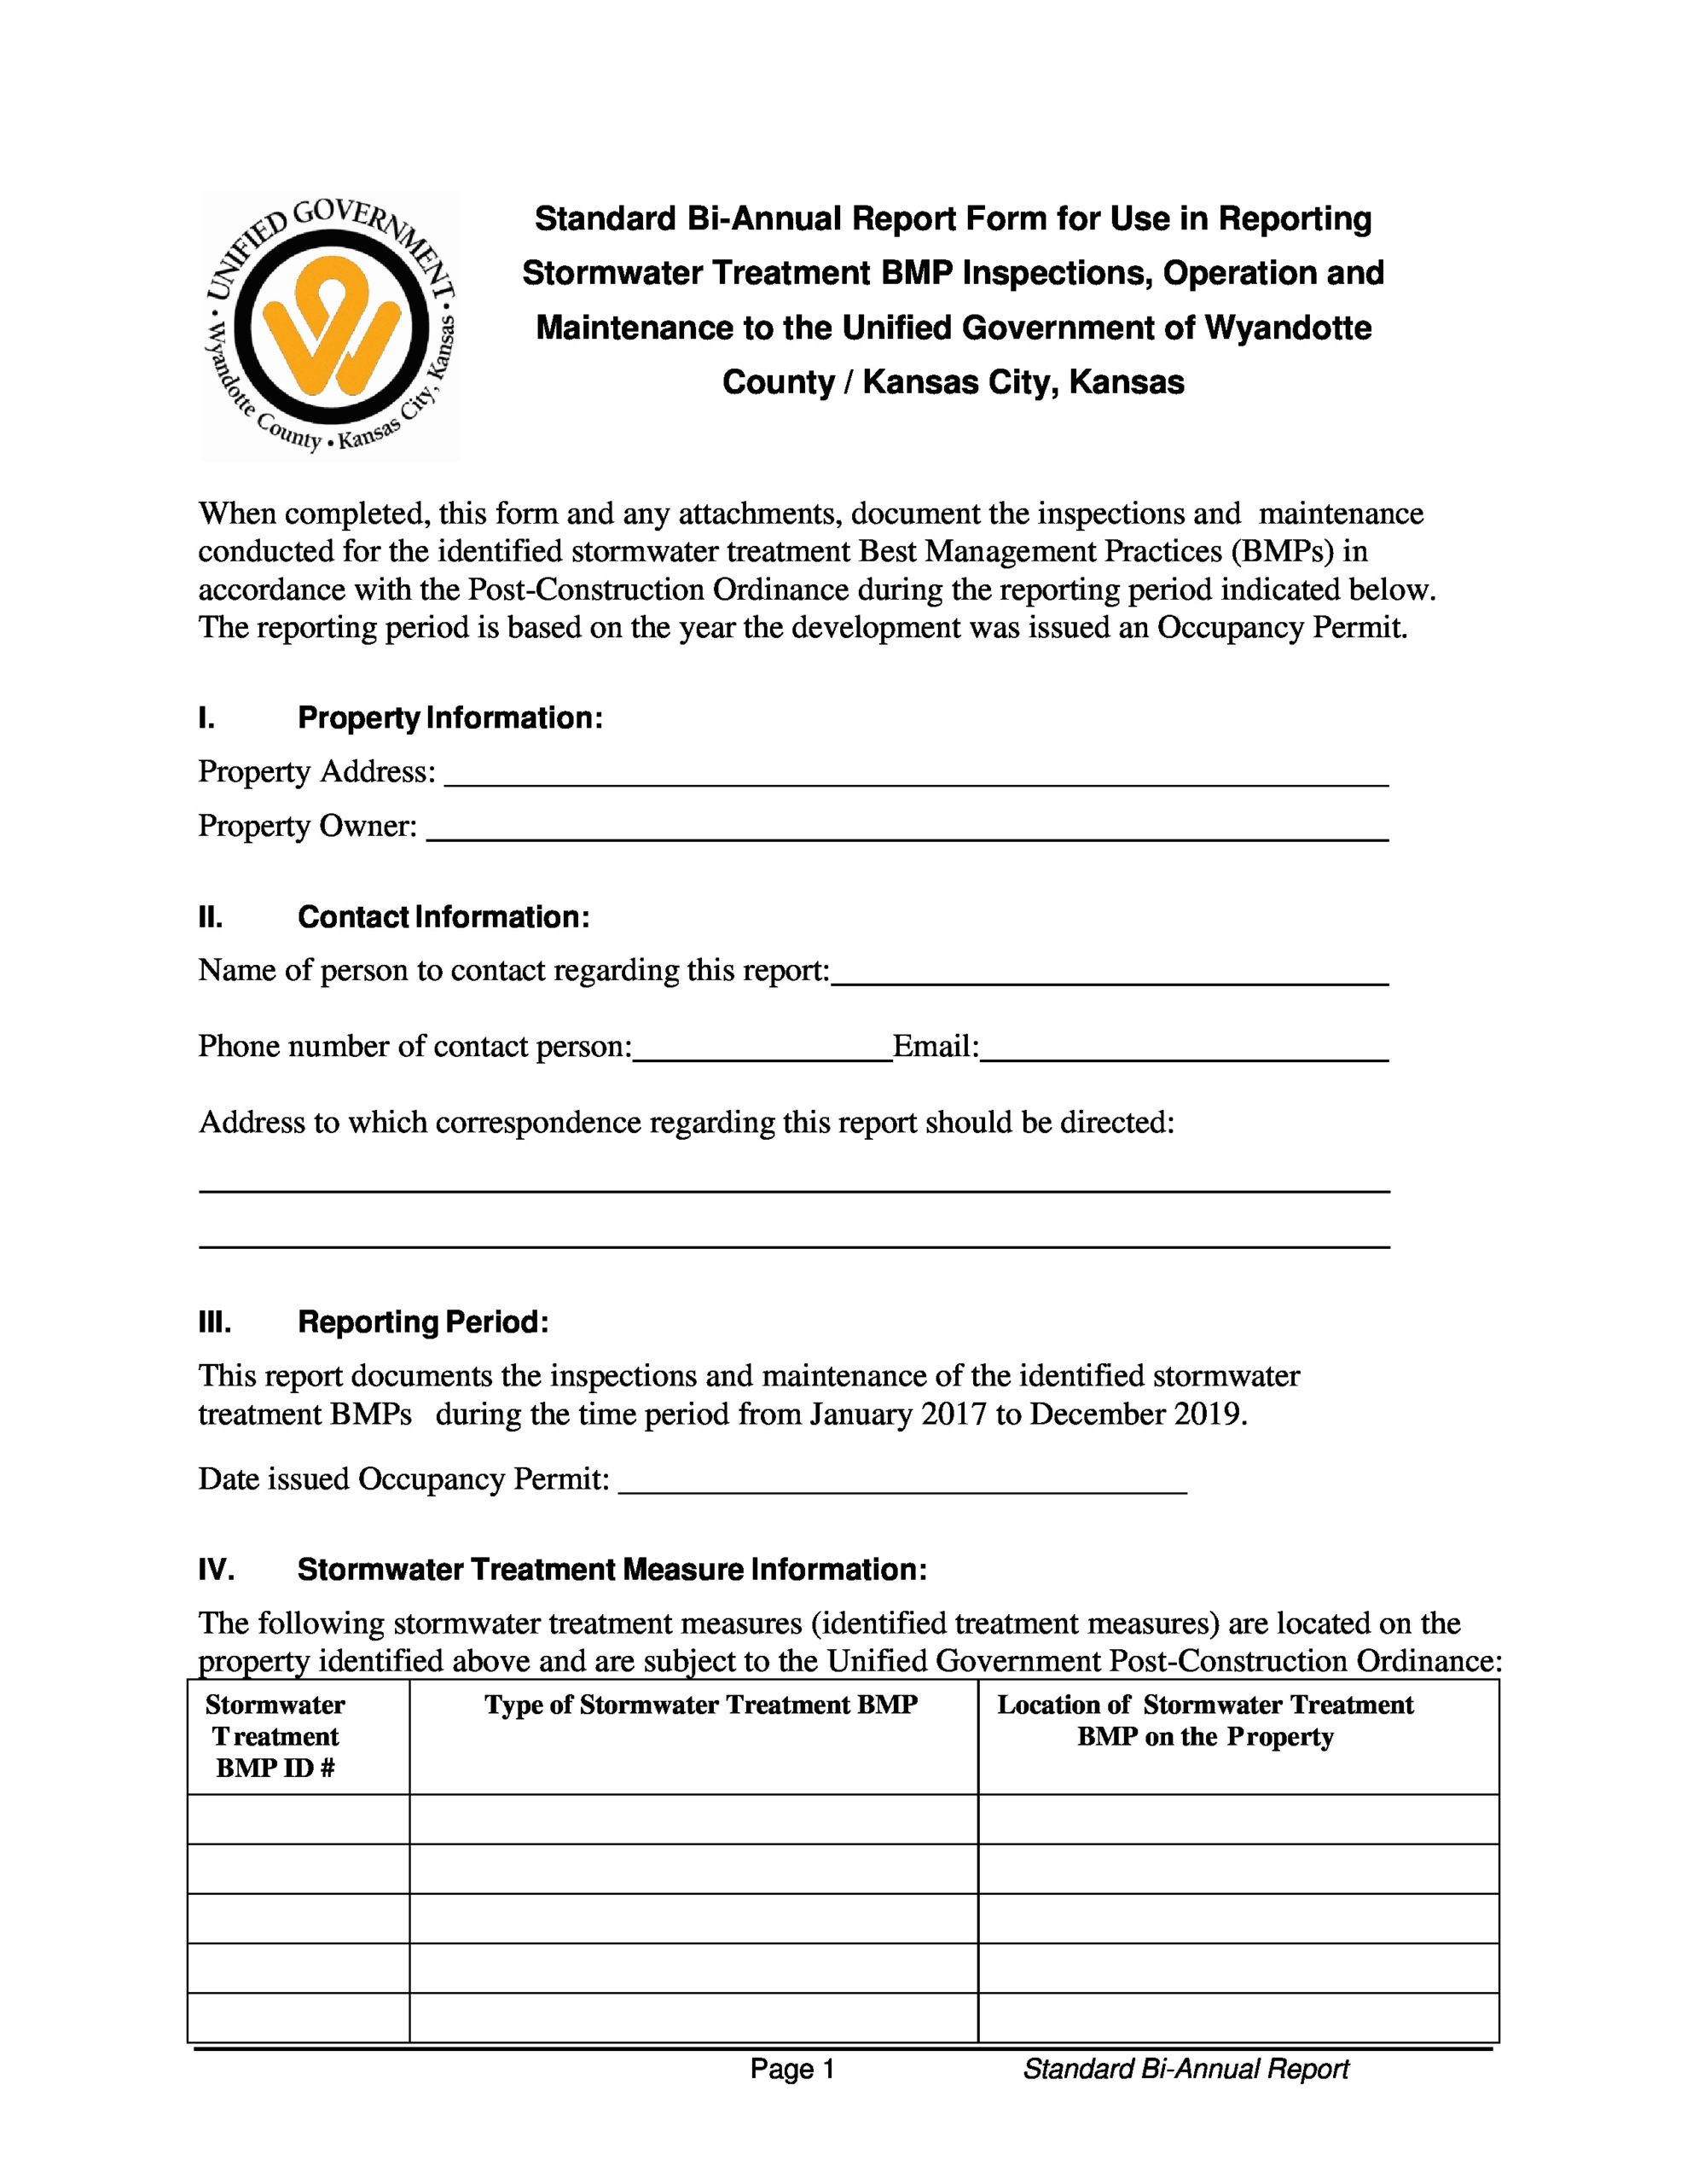 Free maintenance report form 40